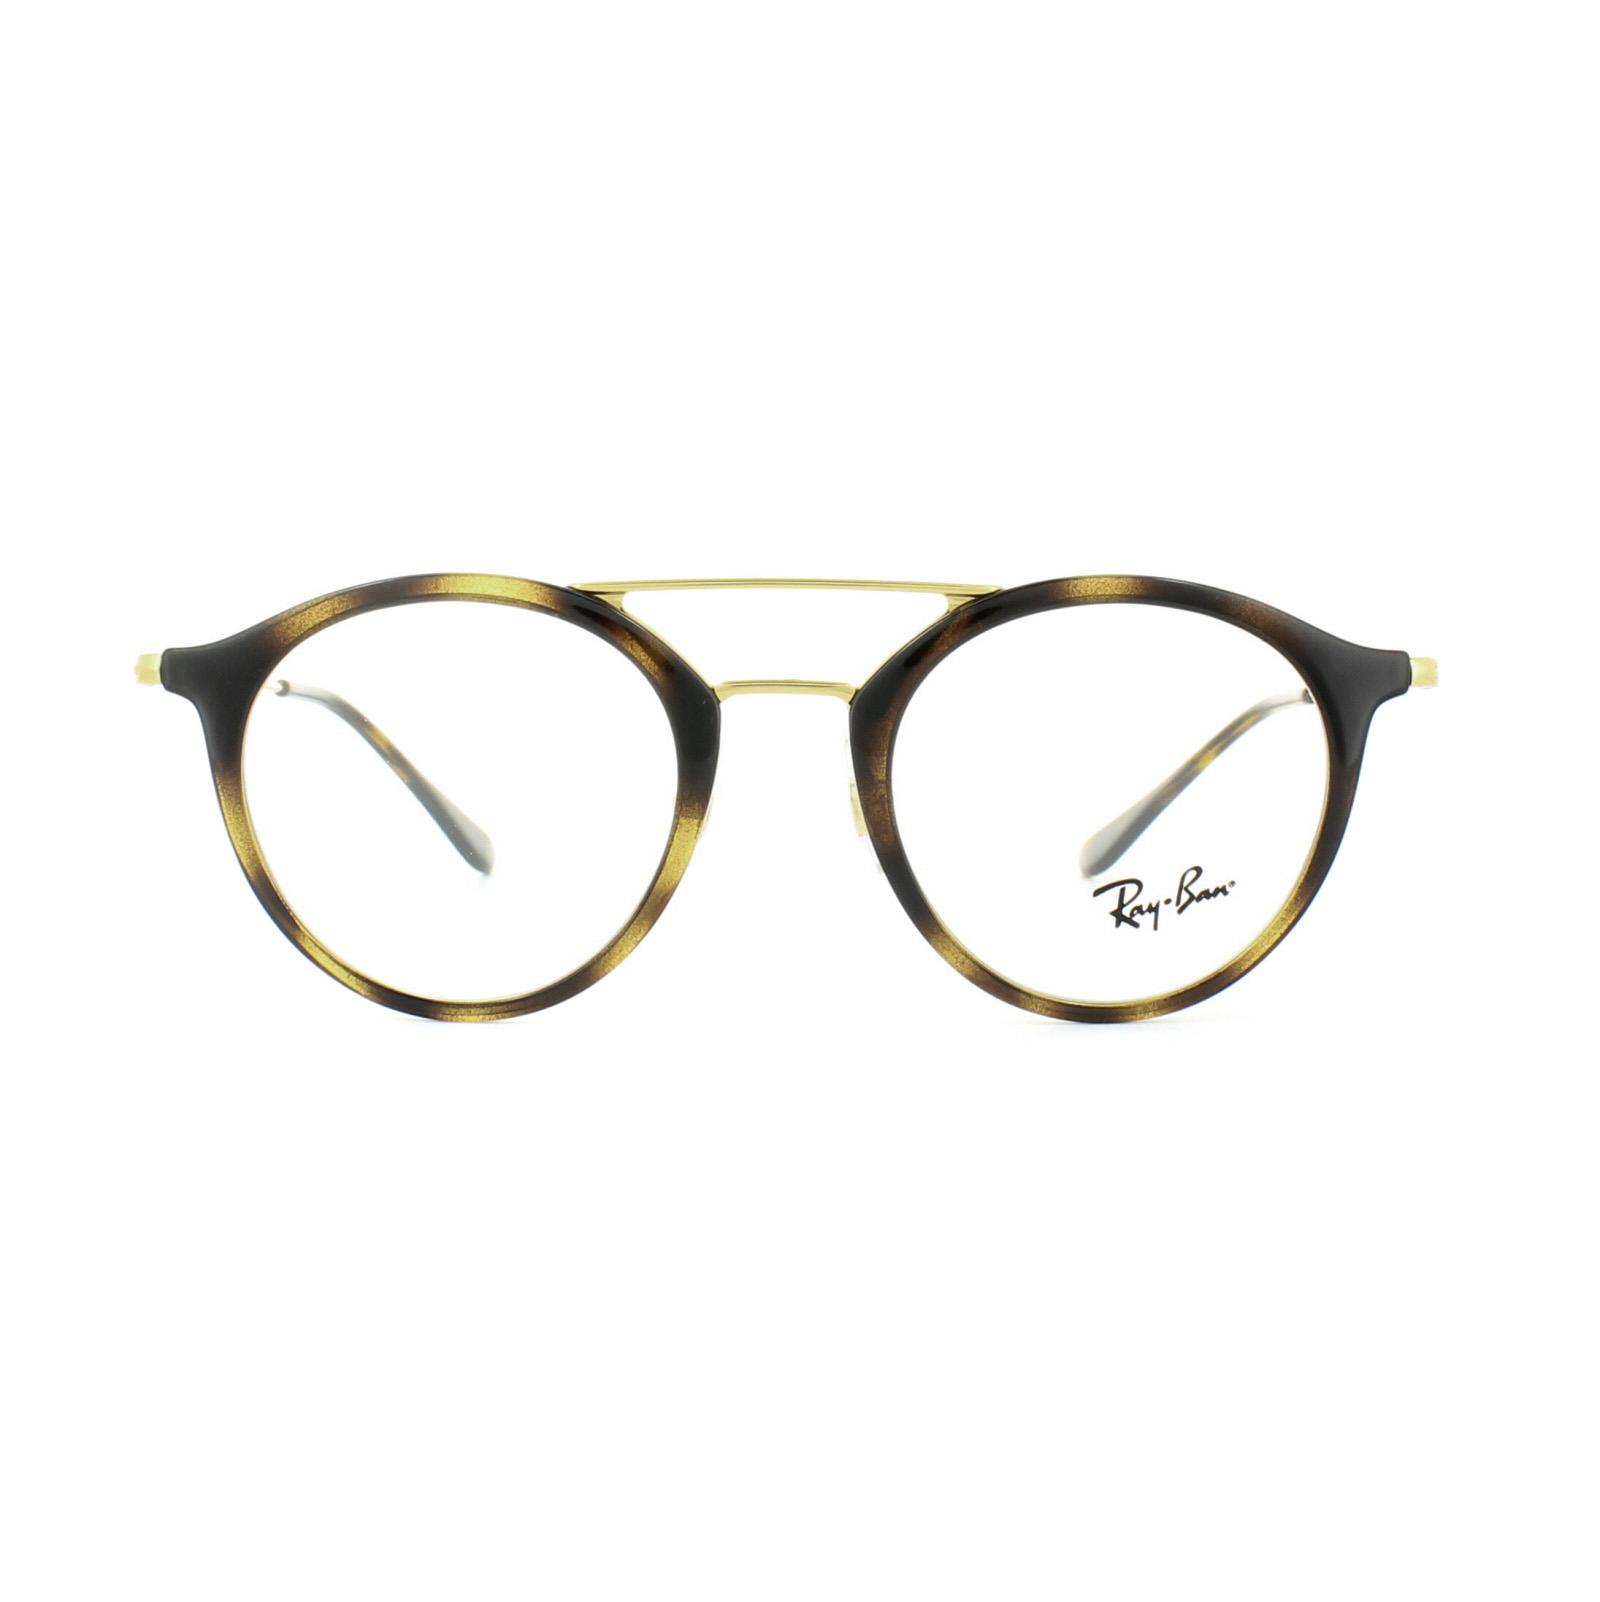 95eece87bb1 Sentinel Ray-Ban Glasses Frames 7097 2012 Havana Gold